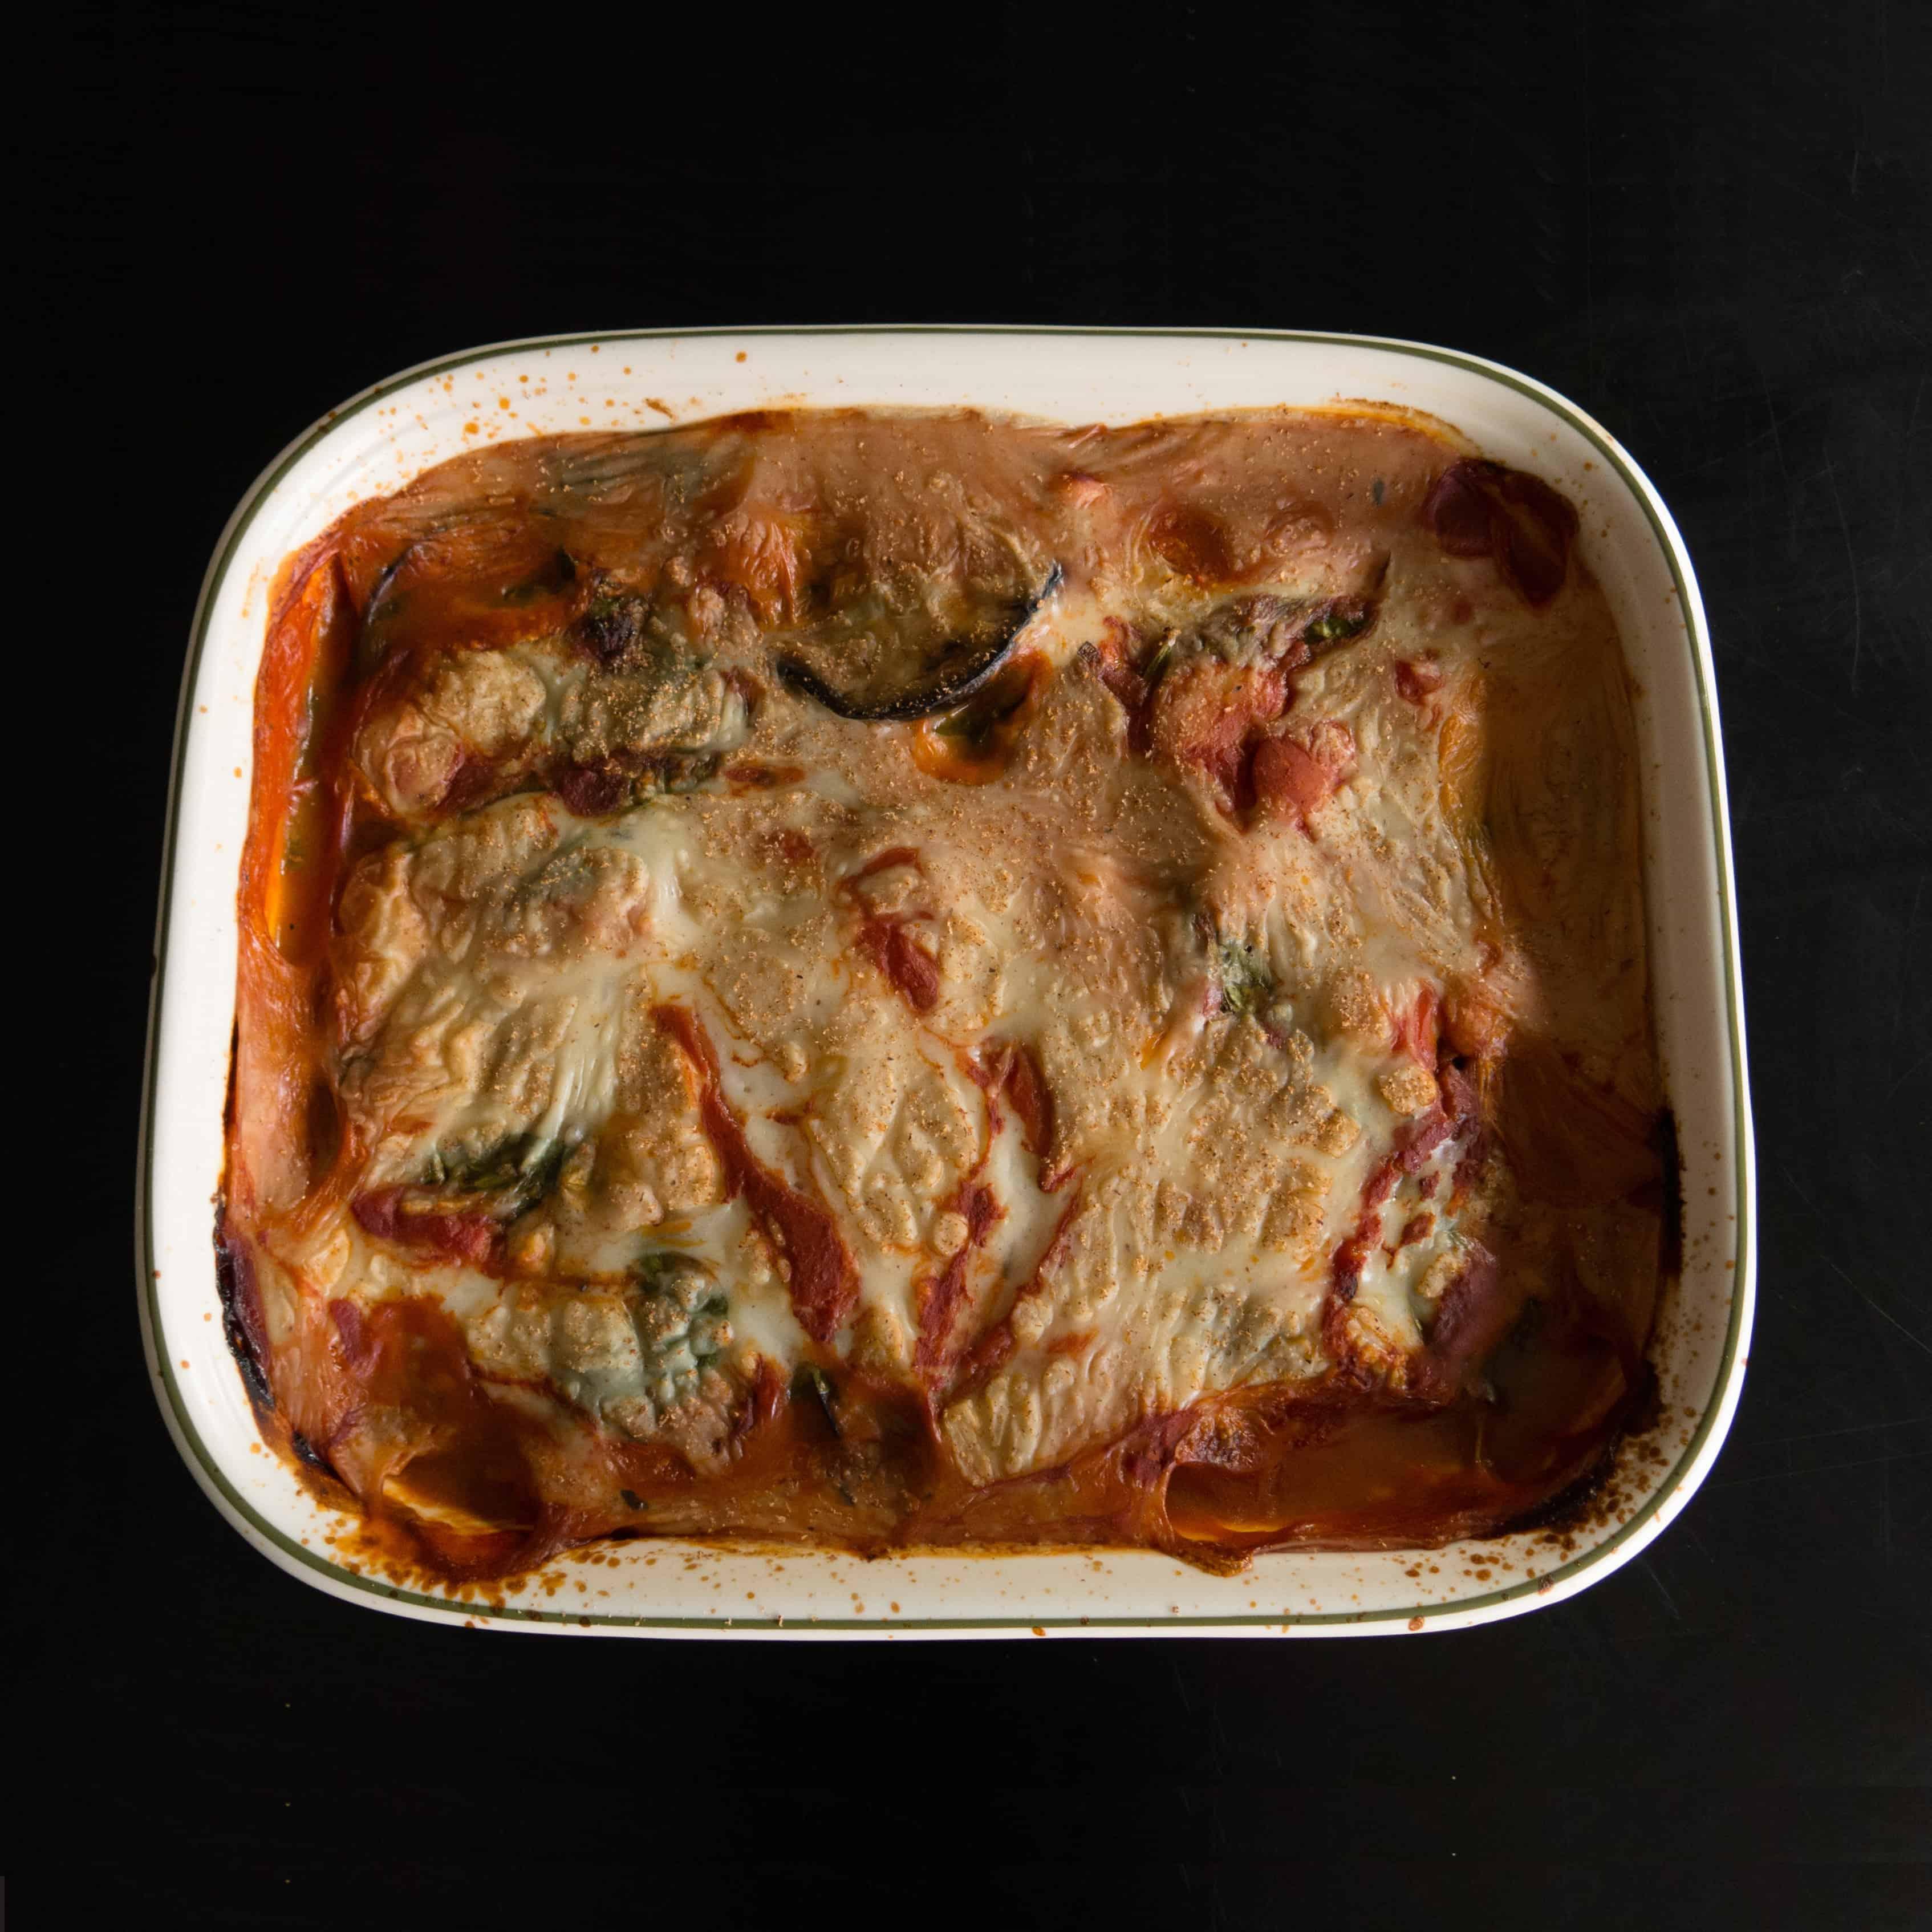 Gluten free, vegan aubergine and butter bean bake. Ready to eat.